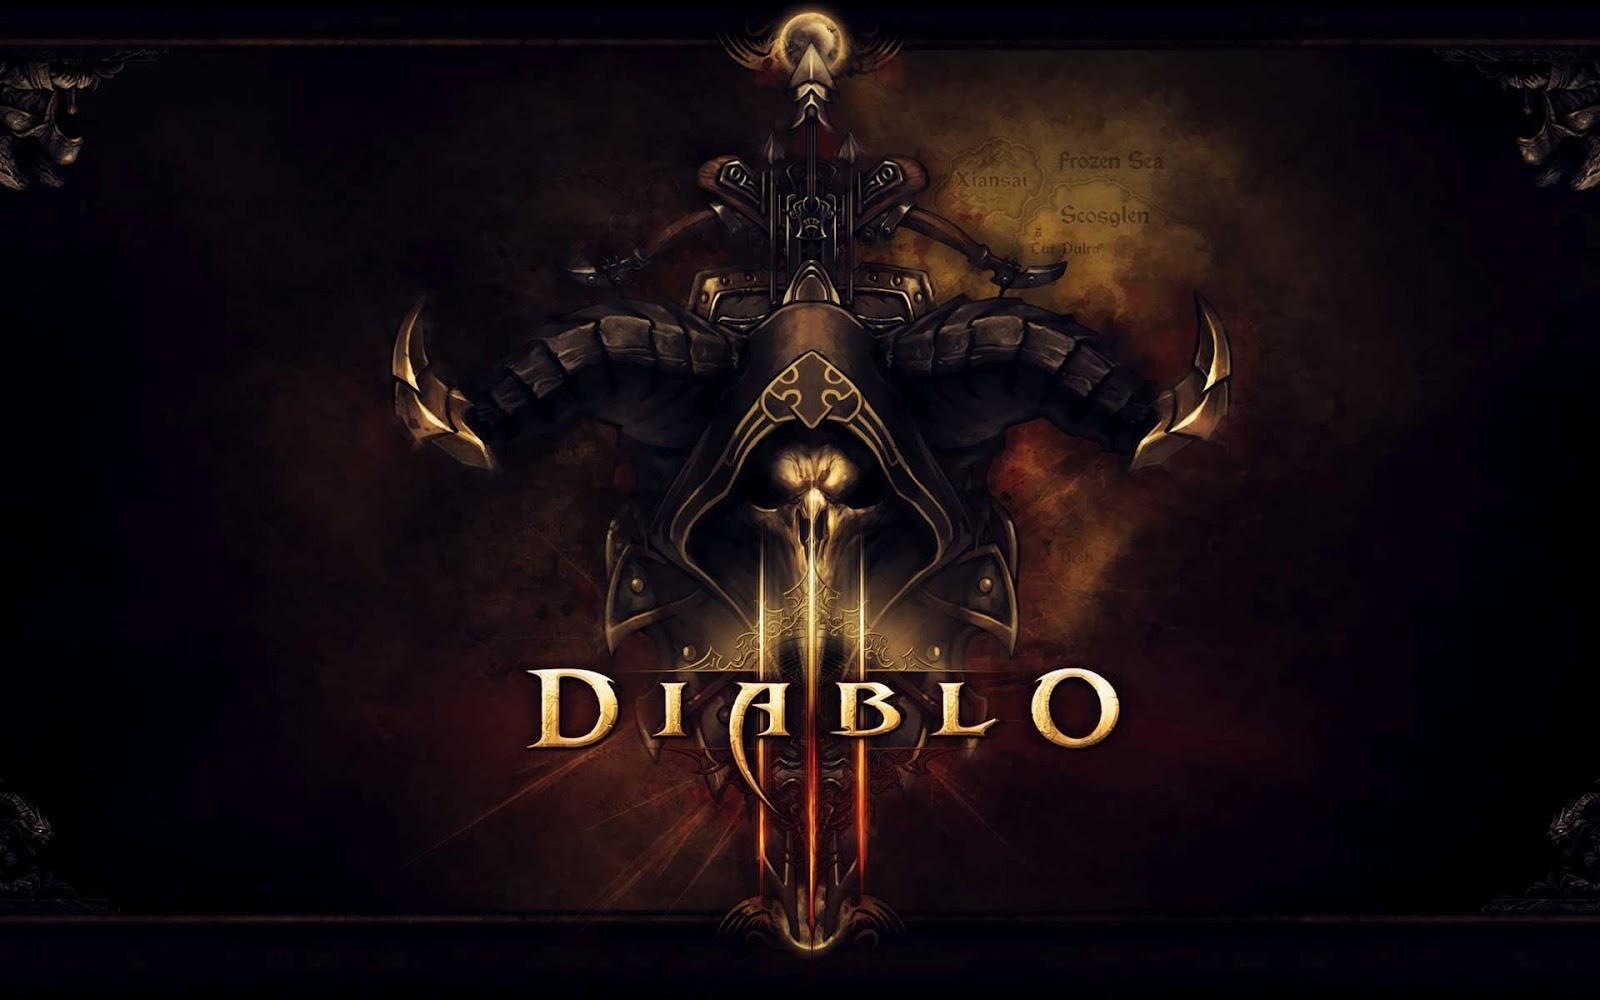 http://4.bp.blogspot.com/-GSoKKCABVXg/T6U5pUEb60I/AAAAAAAABkI/uUXX19MNUp0/s1600/Diablo_3_Skull_Logo_High_Definition_Wallpaper.jpg